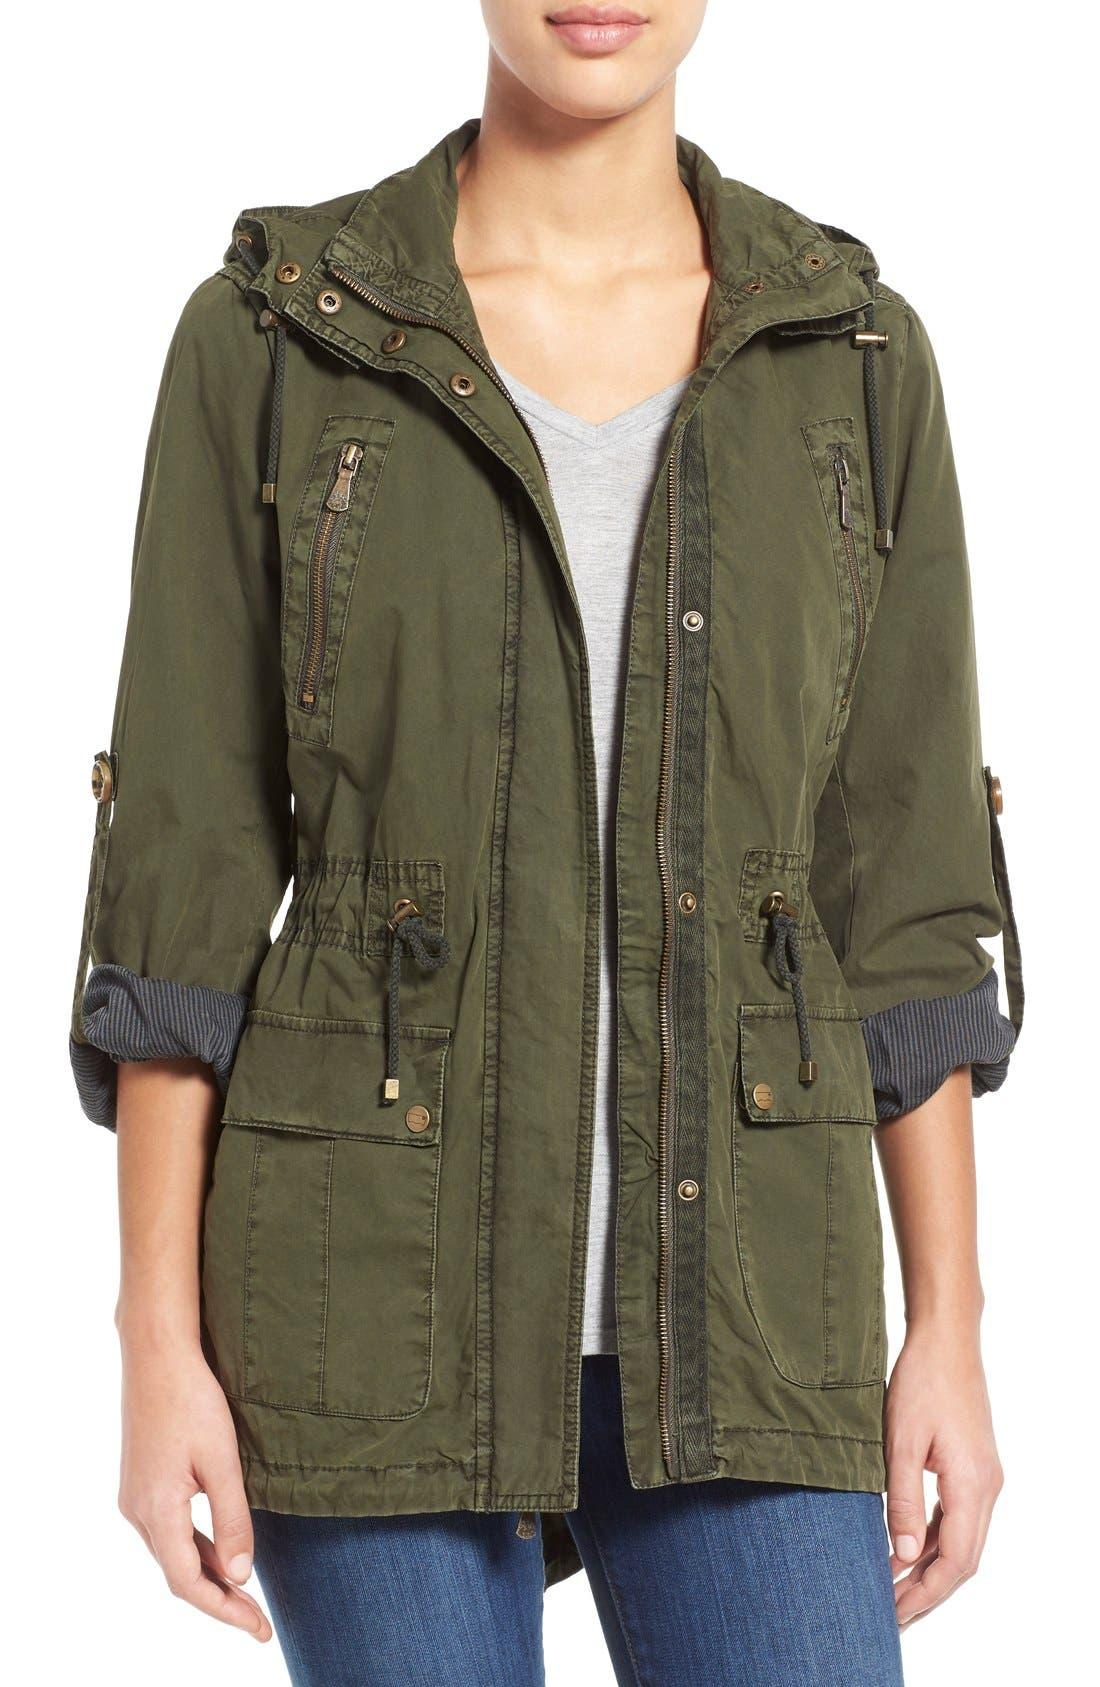 Alternate Image 1 Selected - Levi's® Parachute Hooded Cotton Utility Jacket